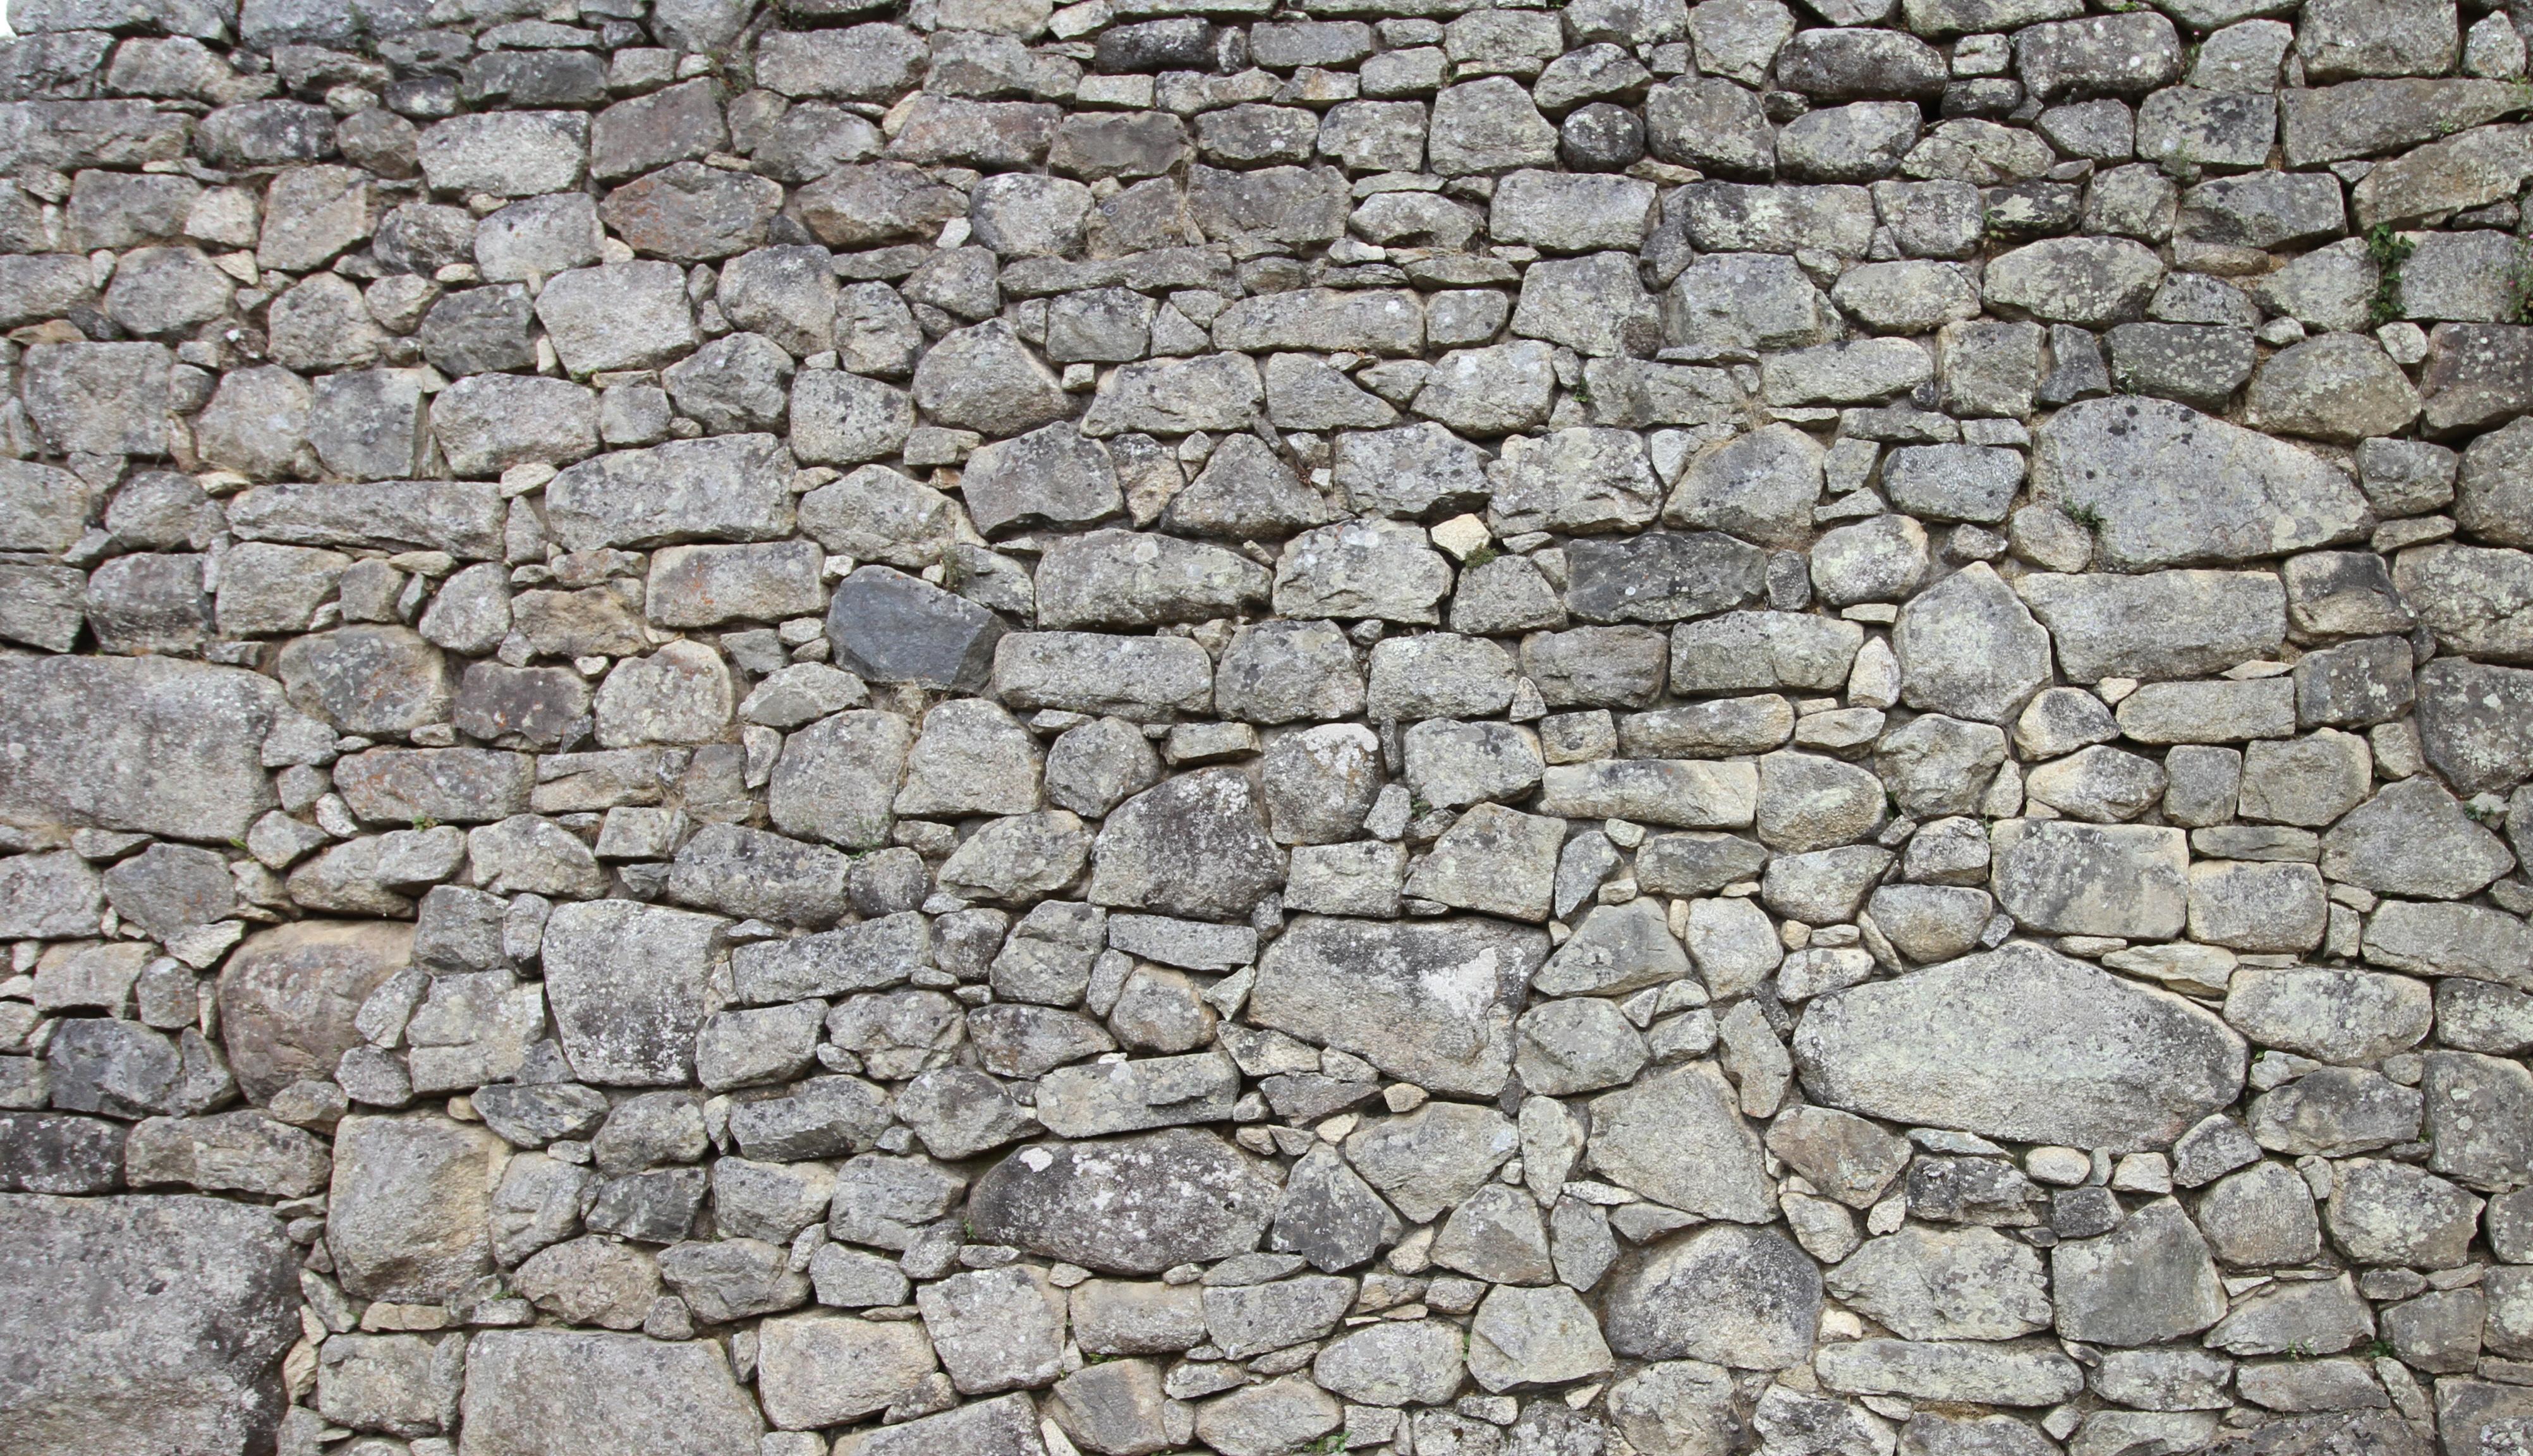 Rock texture photo